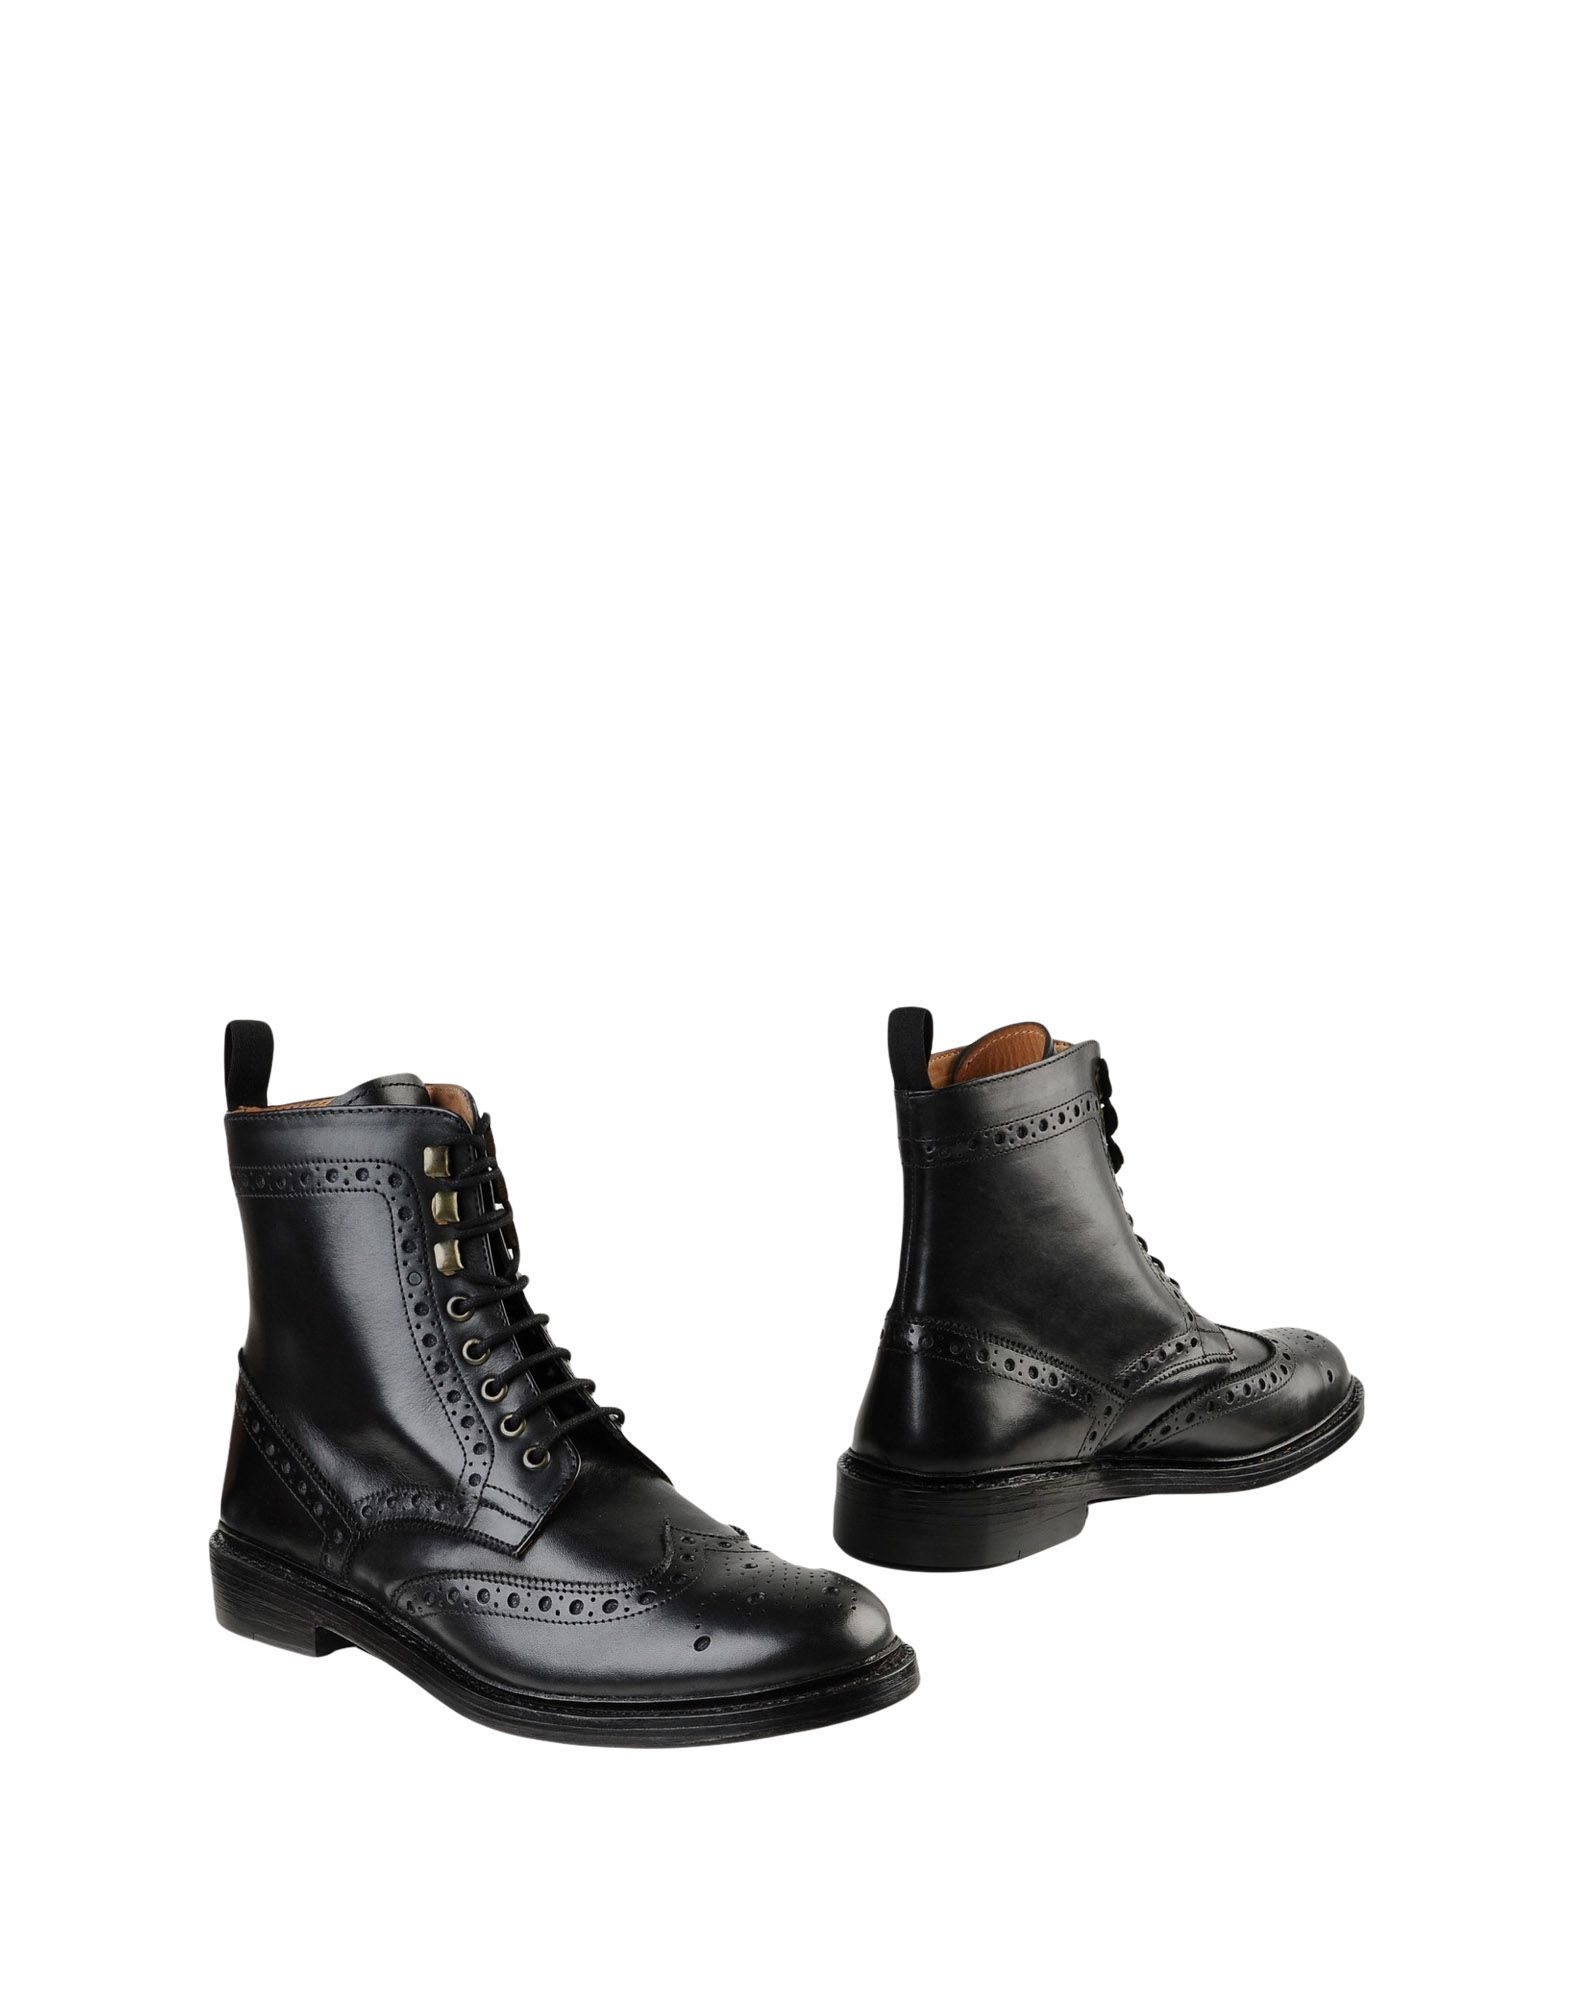 Leonardo Principi Stiefelette Herren  11539575OG Gute Qualität beliebte Schuhe